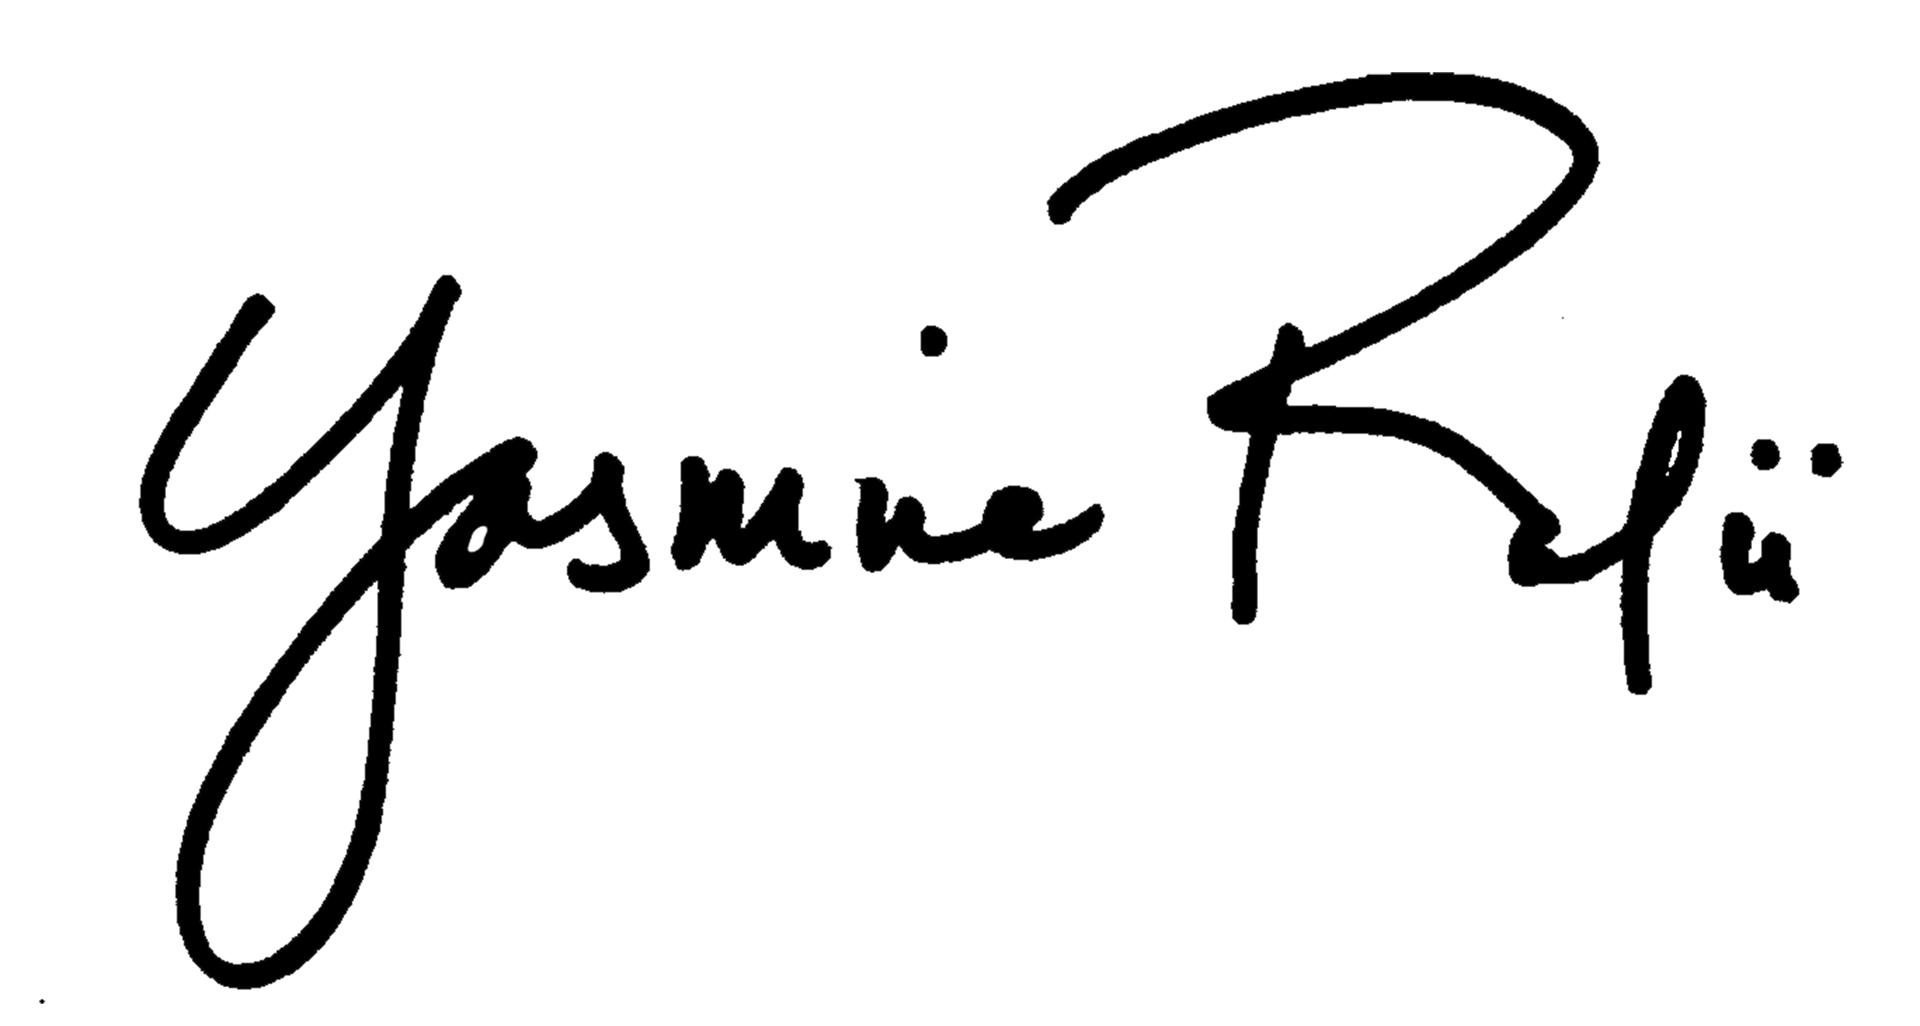 yasmine rafii's Signature